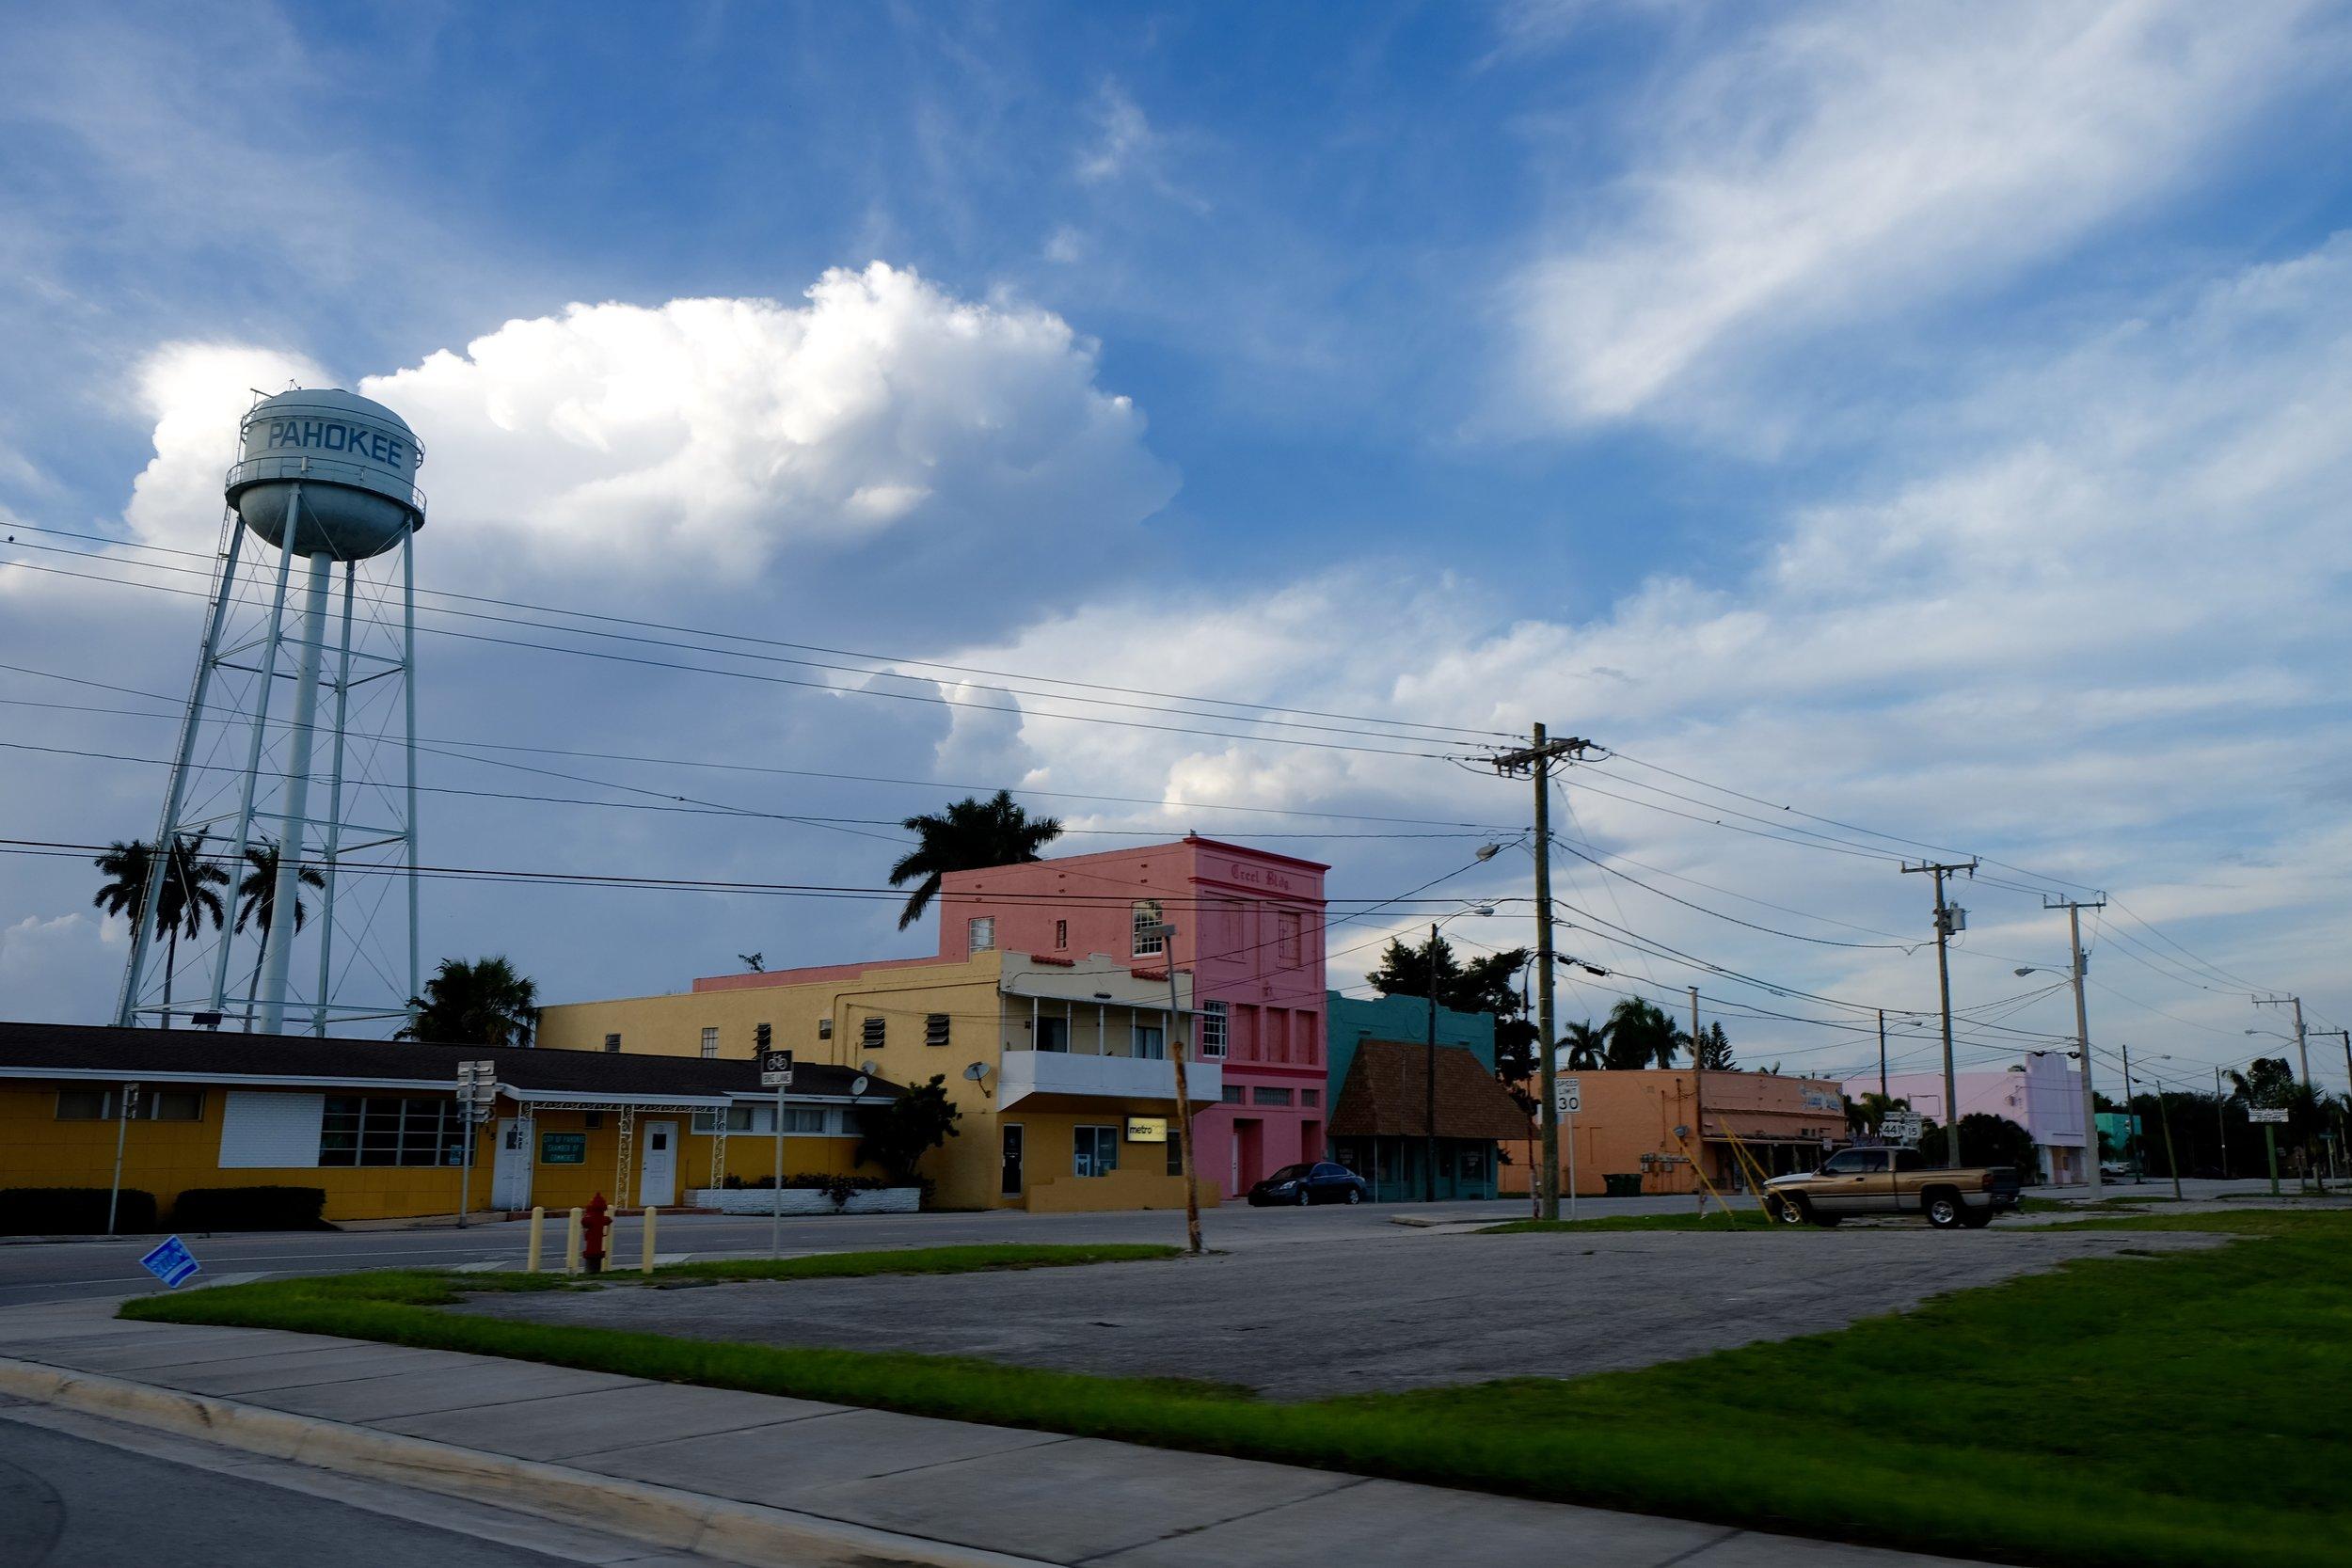 Pahokee, Florida